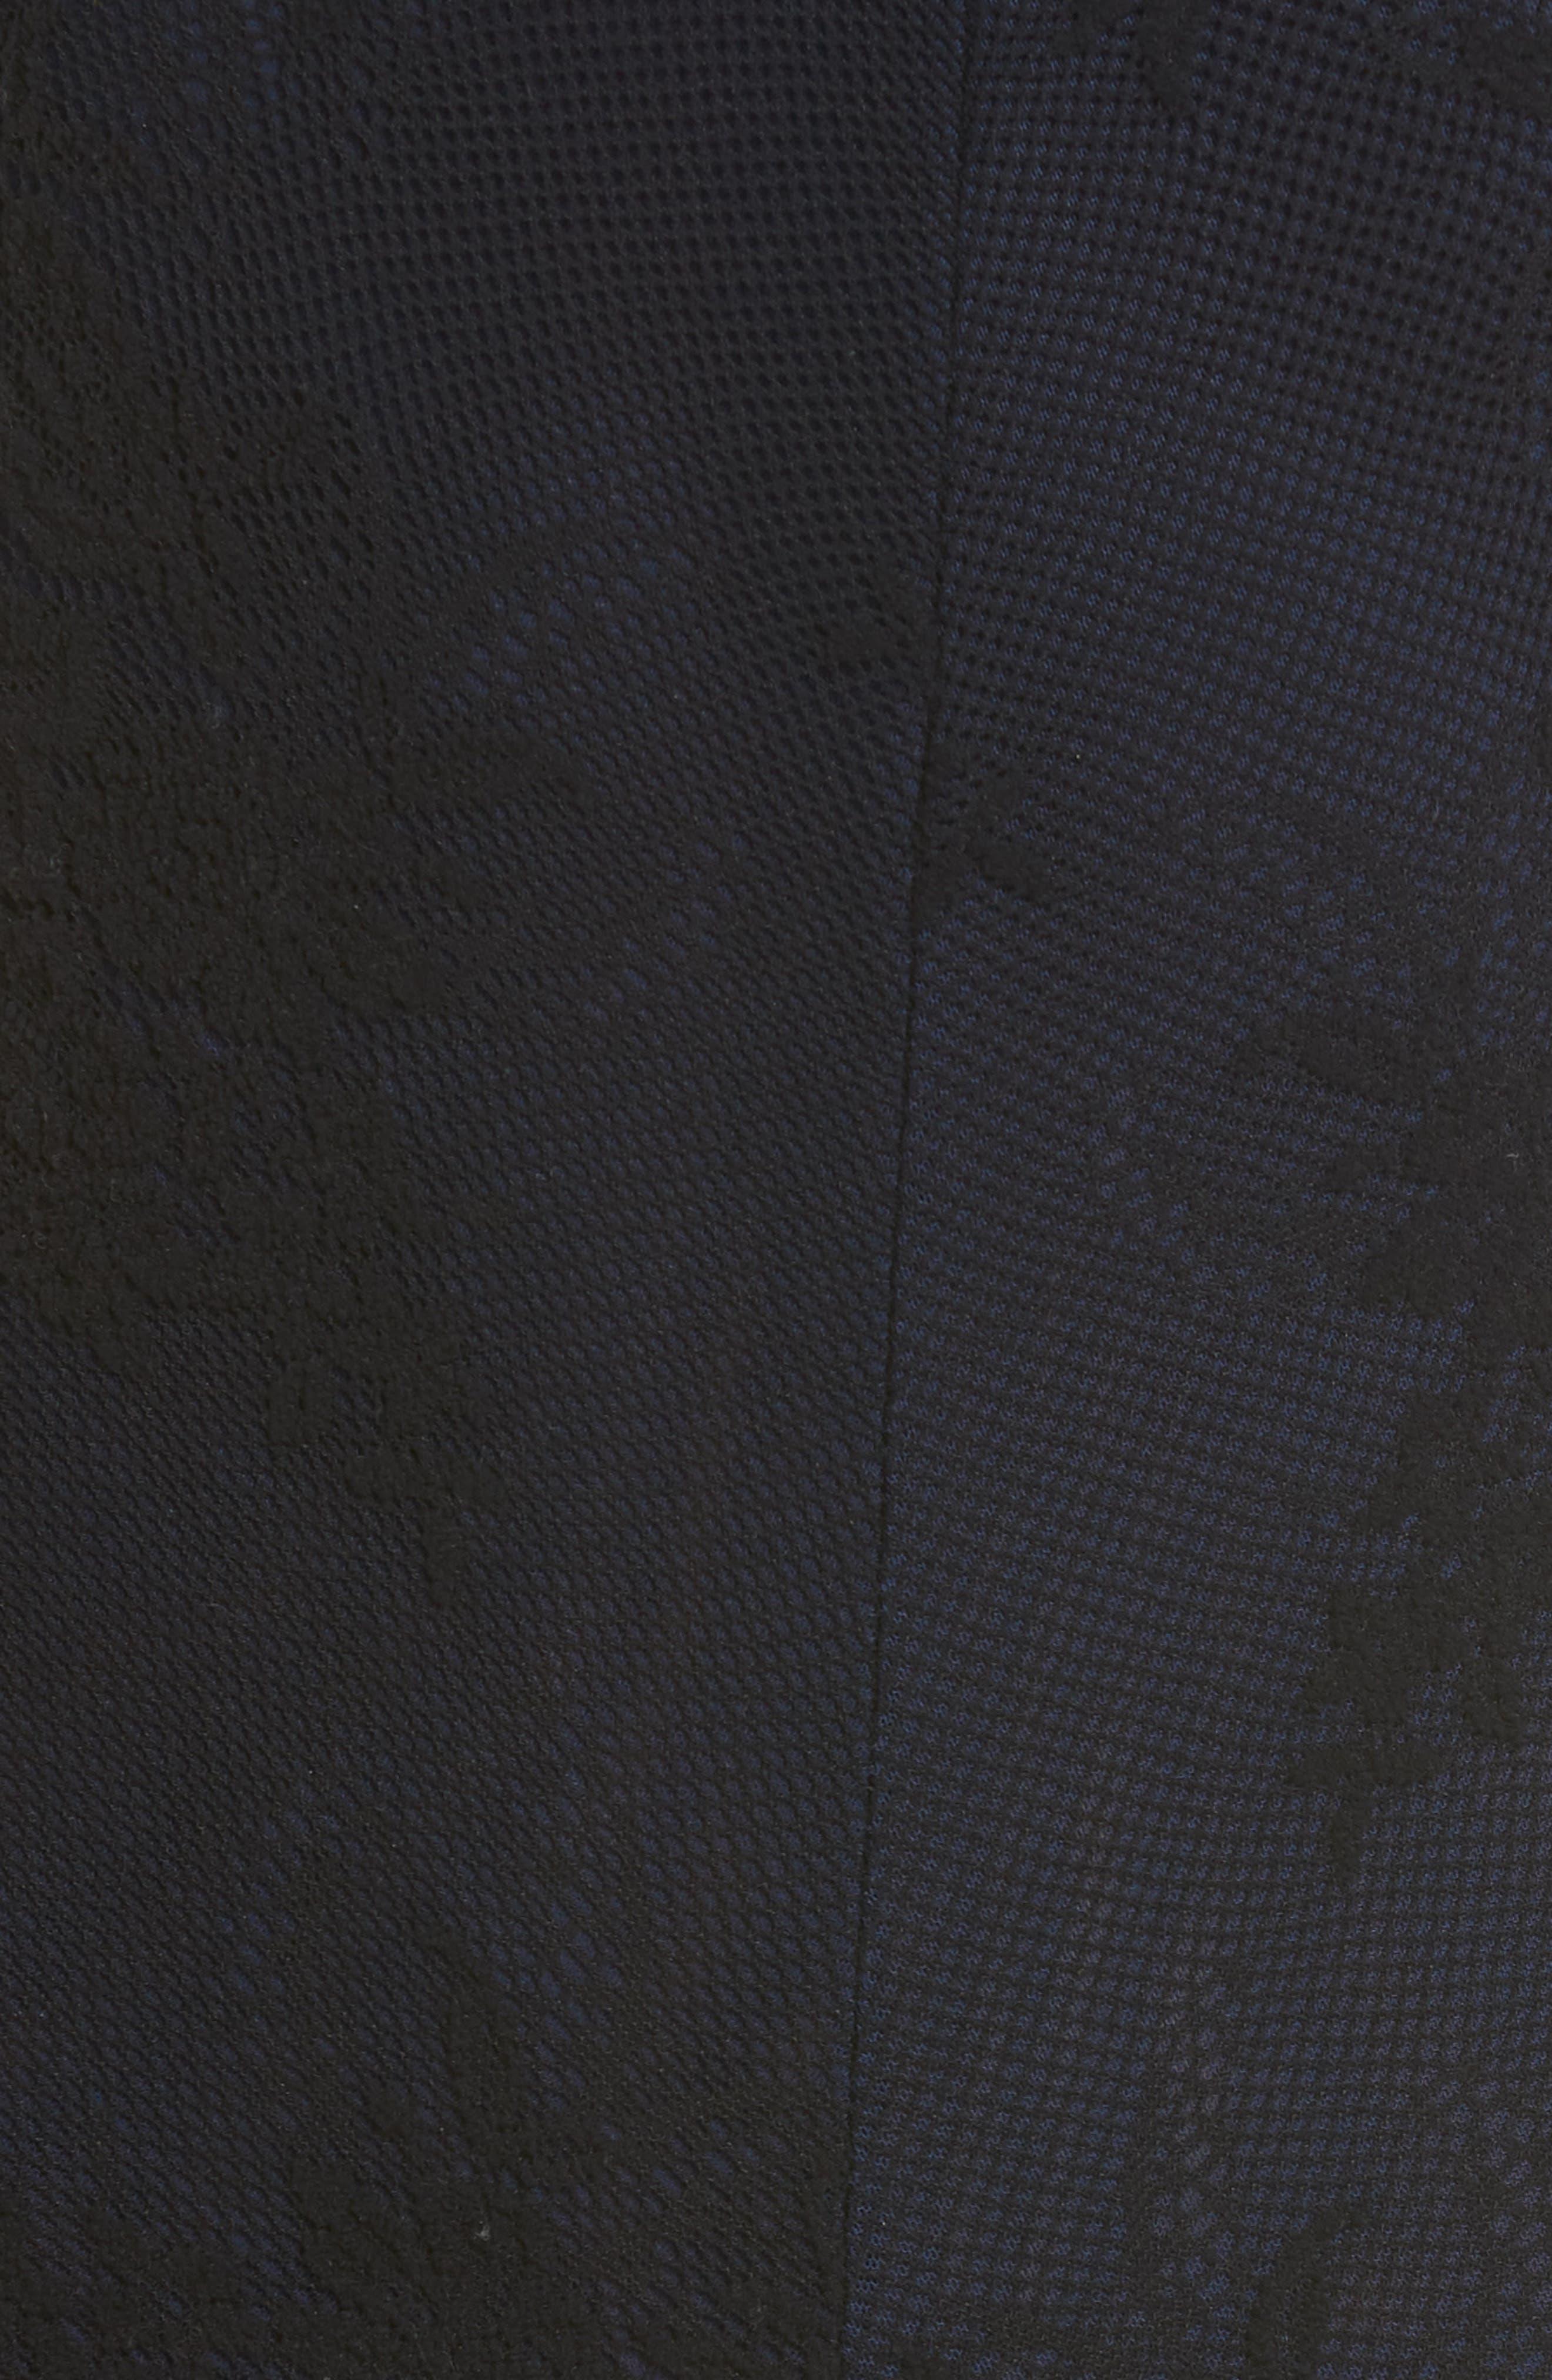 FREE PEOPLE, Miley Lace Bodysuit, Alternate thumbnail 5, color, BLACK